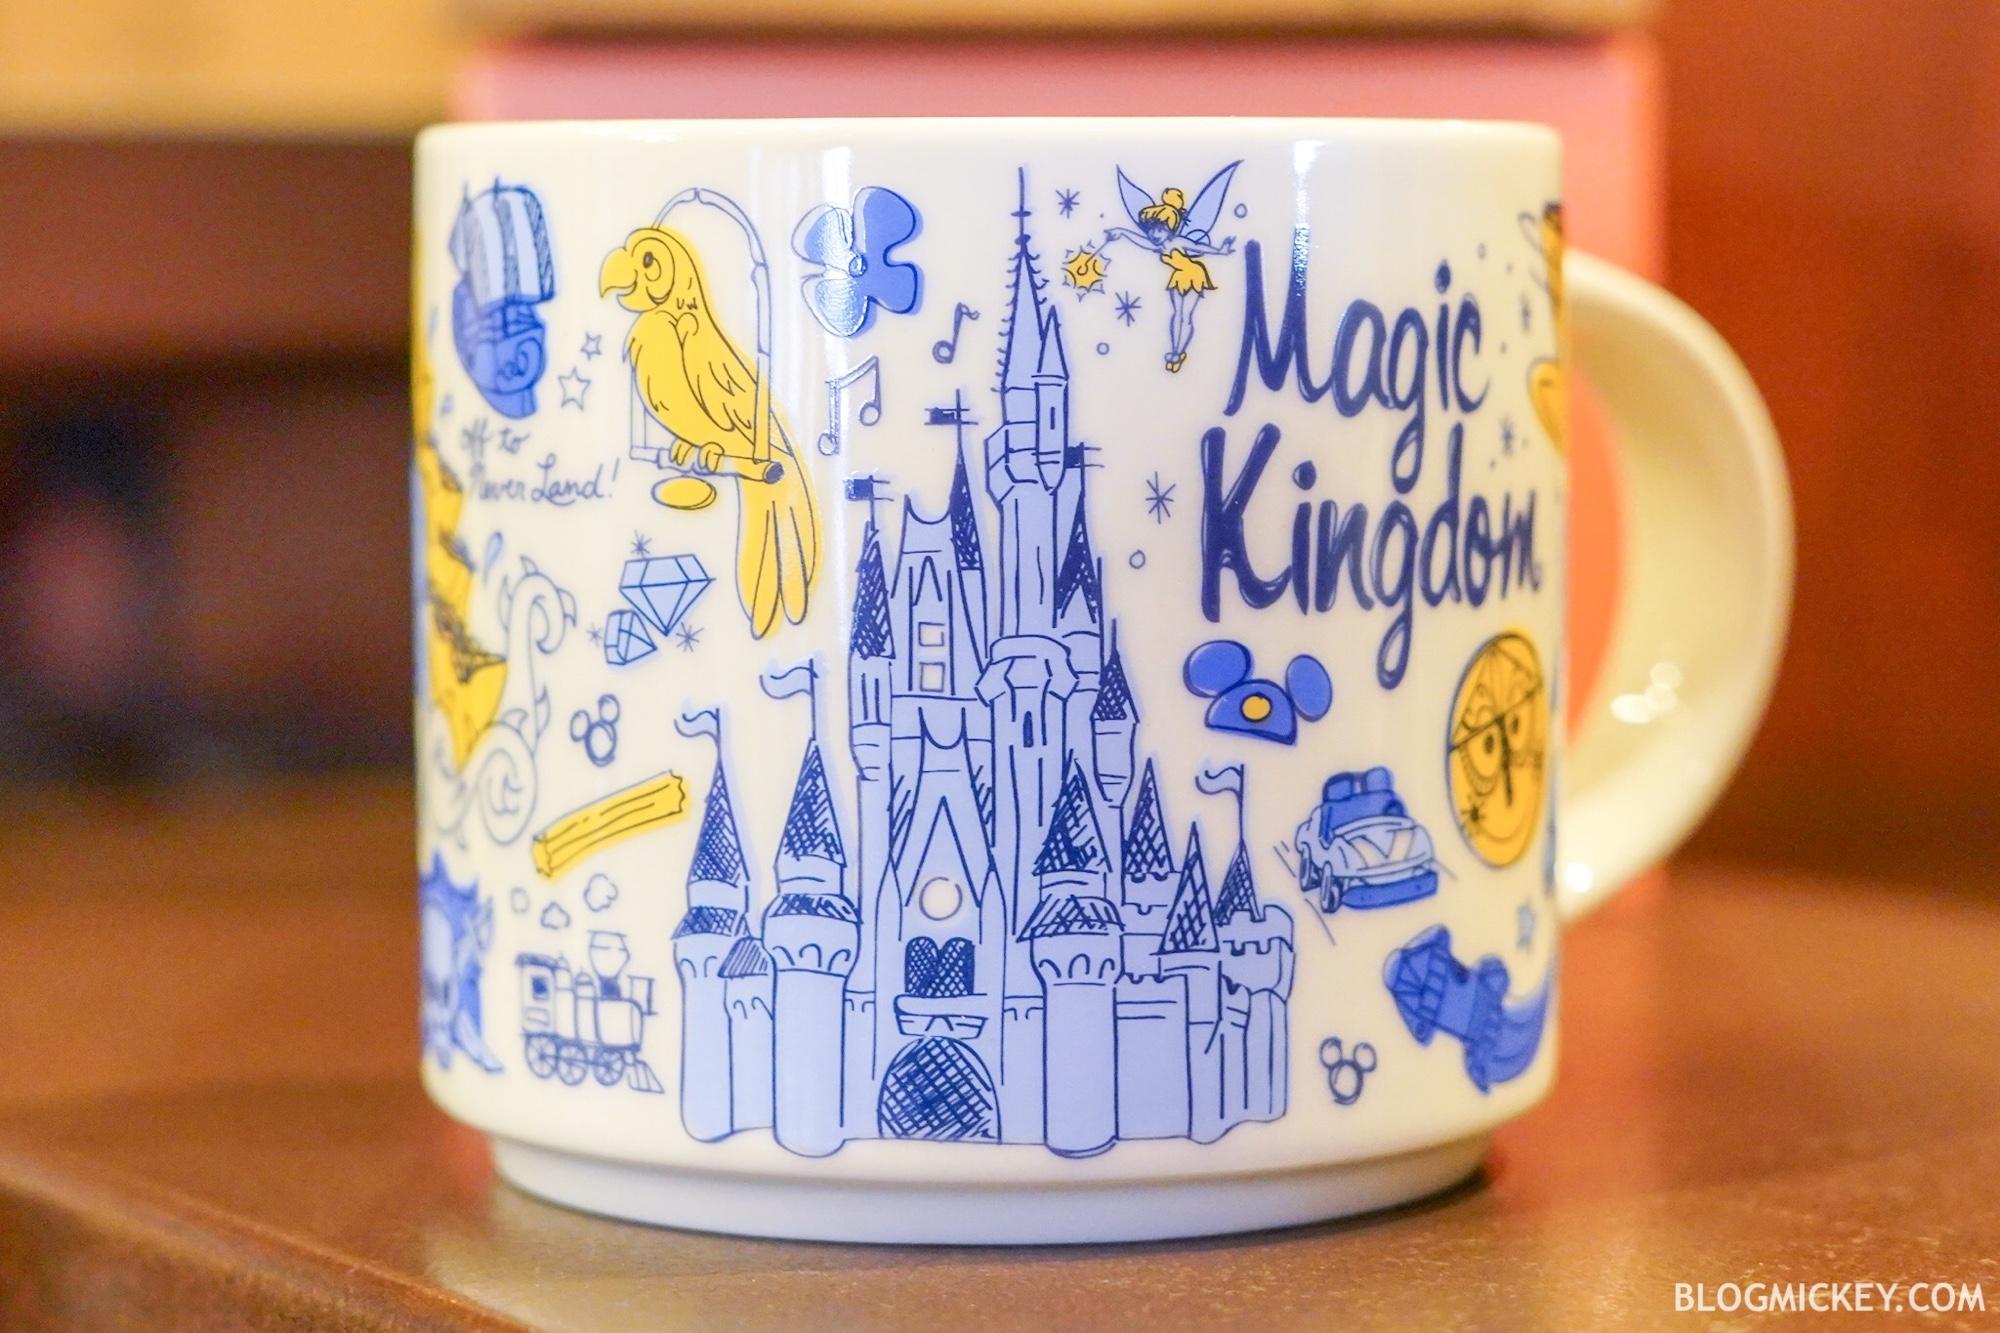 New Starbucks Magic Kingdom Been There Series Mug Arrives